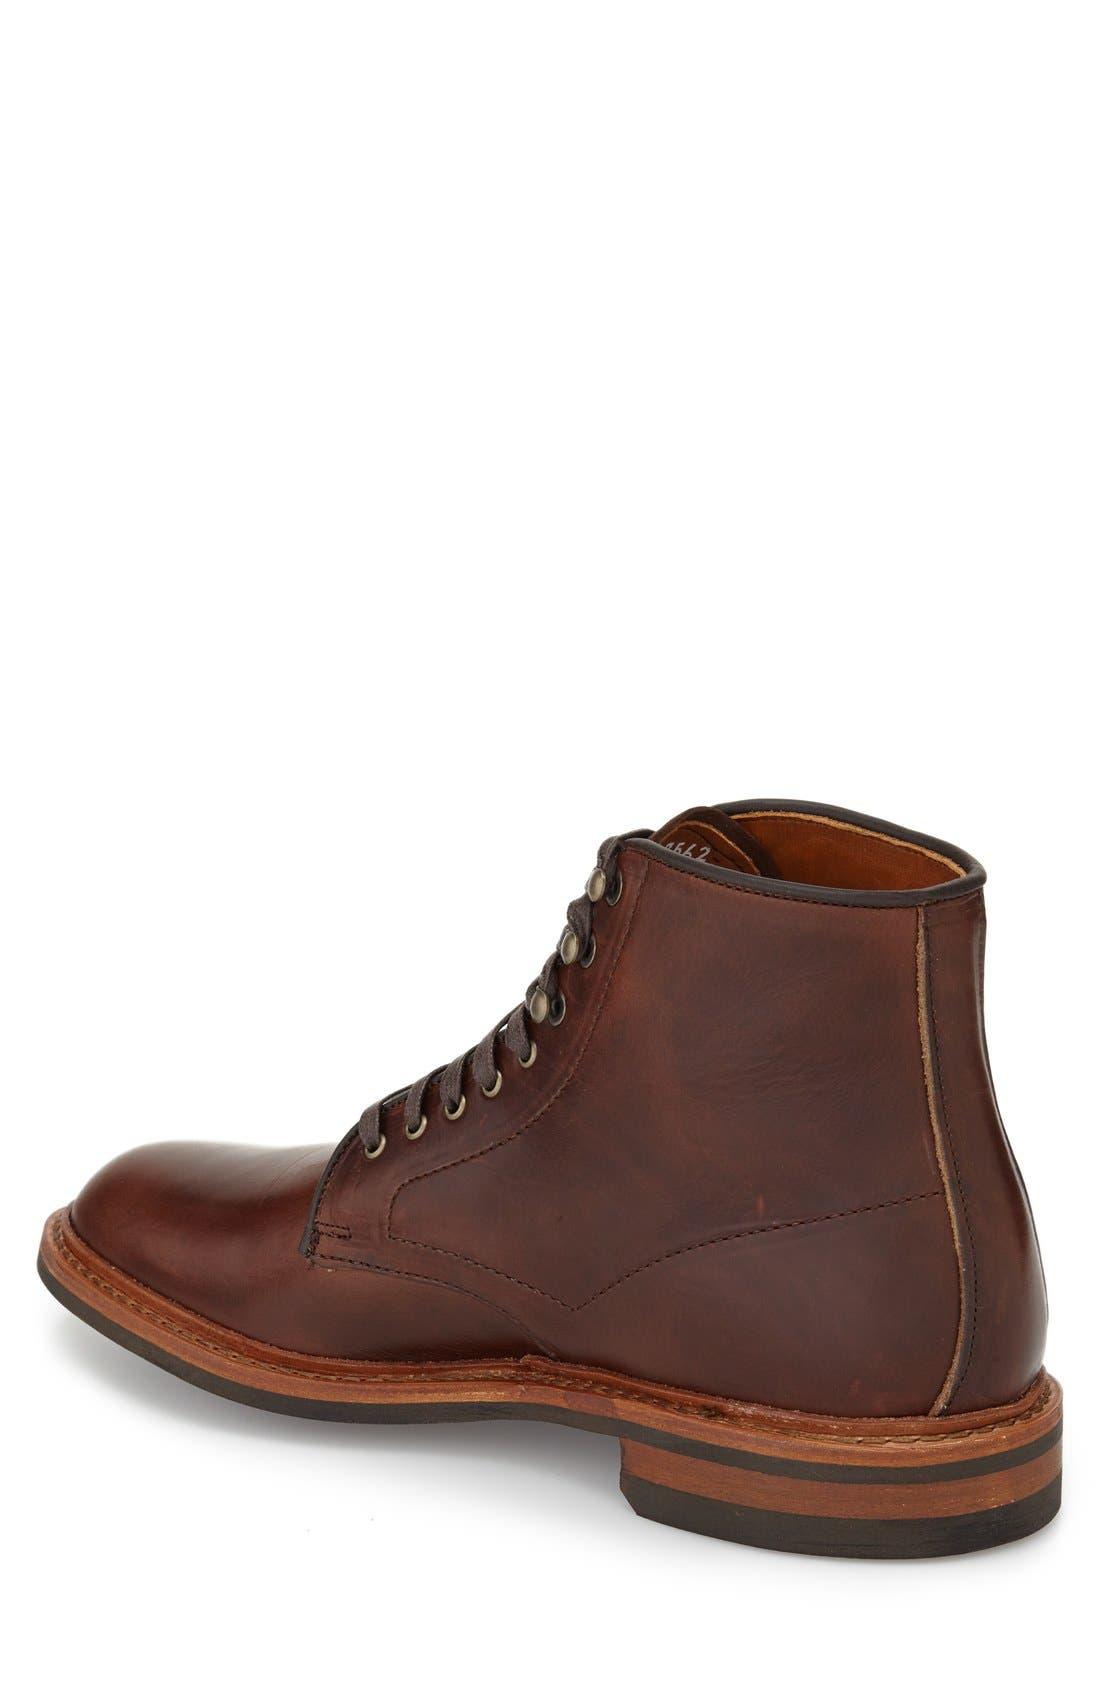 Alternate Image 2  - Allen Edmonds 'Higgins Mill' Plain Toe Boot (Men)